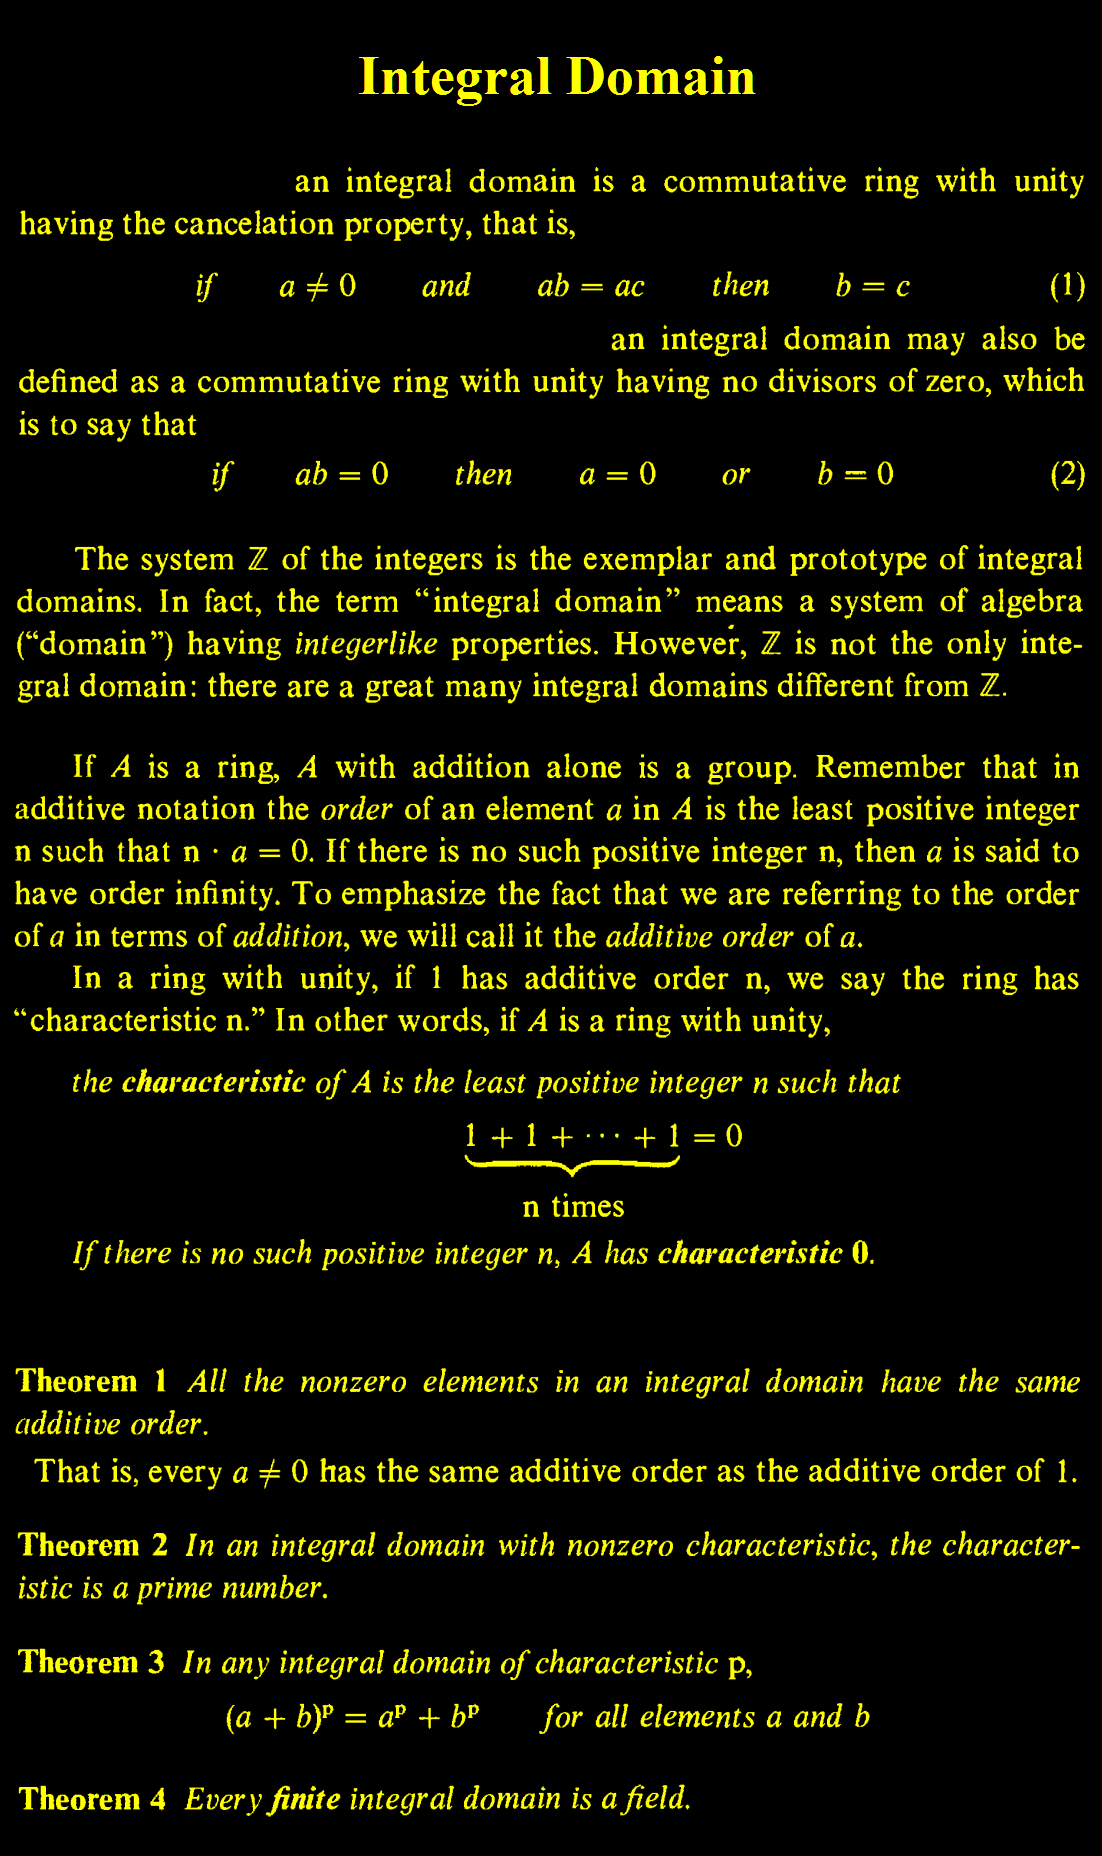 Integral Domain Advanced Mathematics Mathematics Worksheets Physics And Mathematics